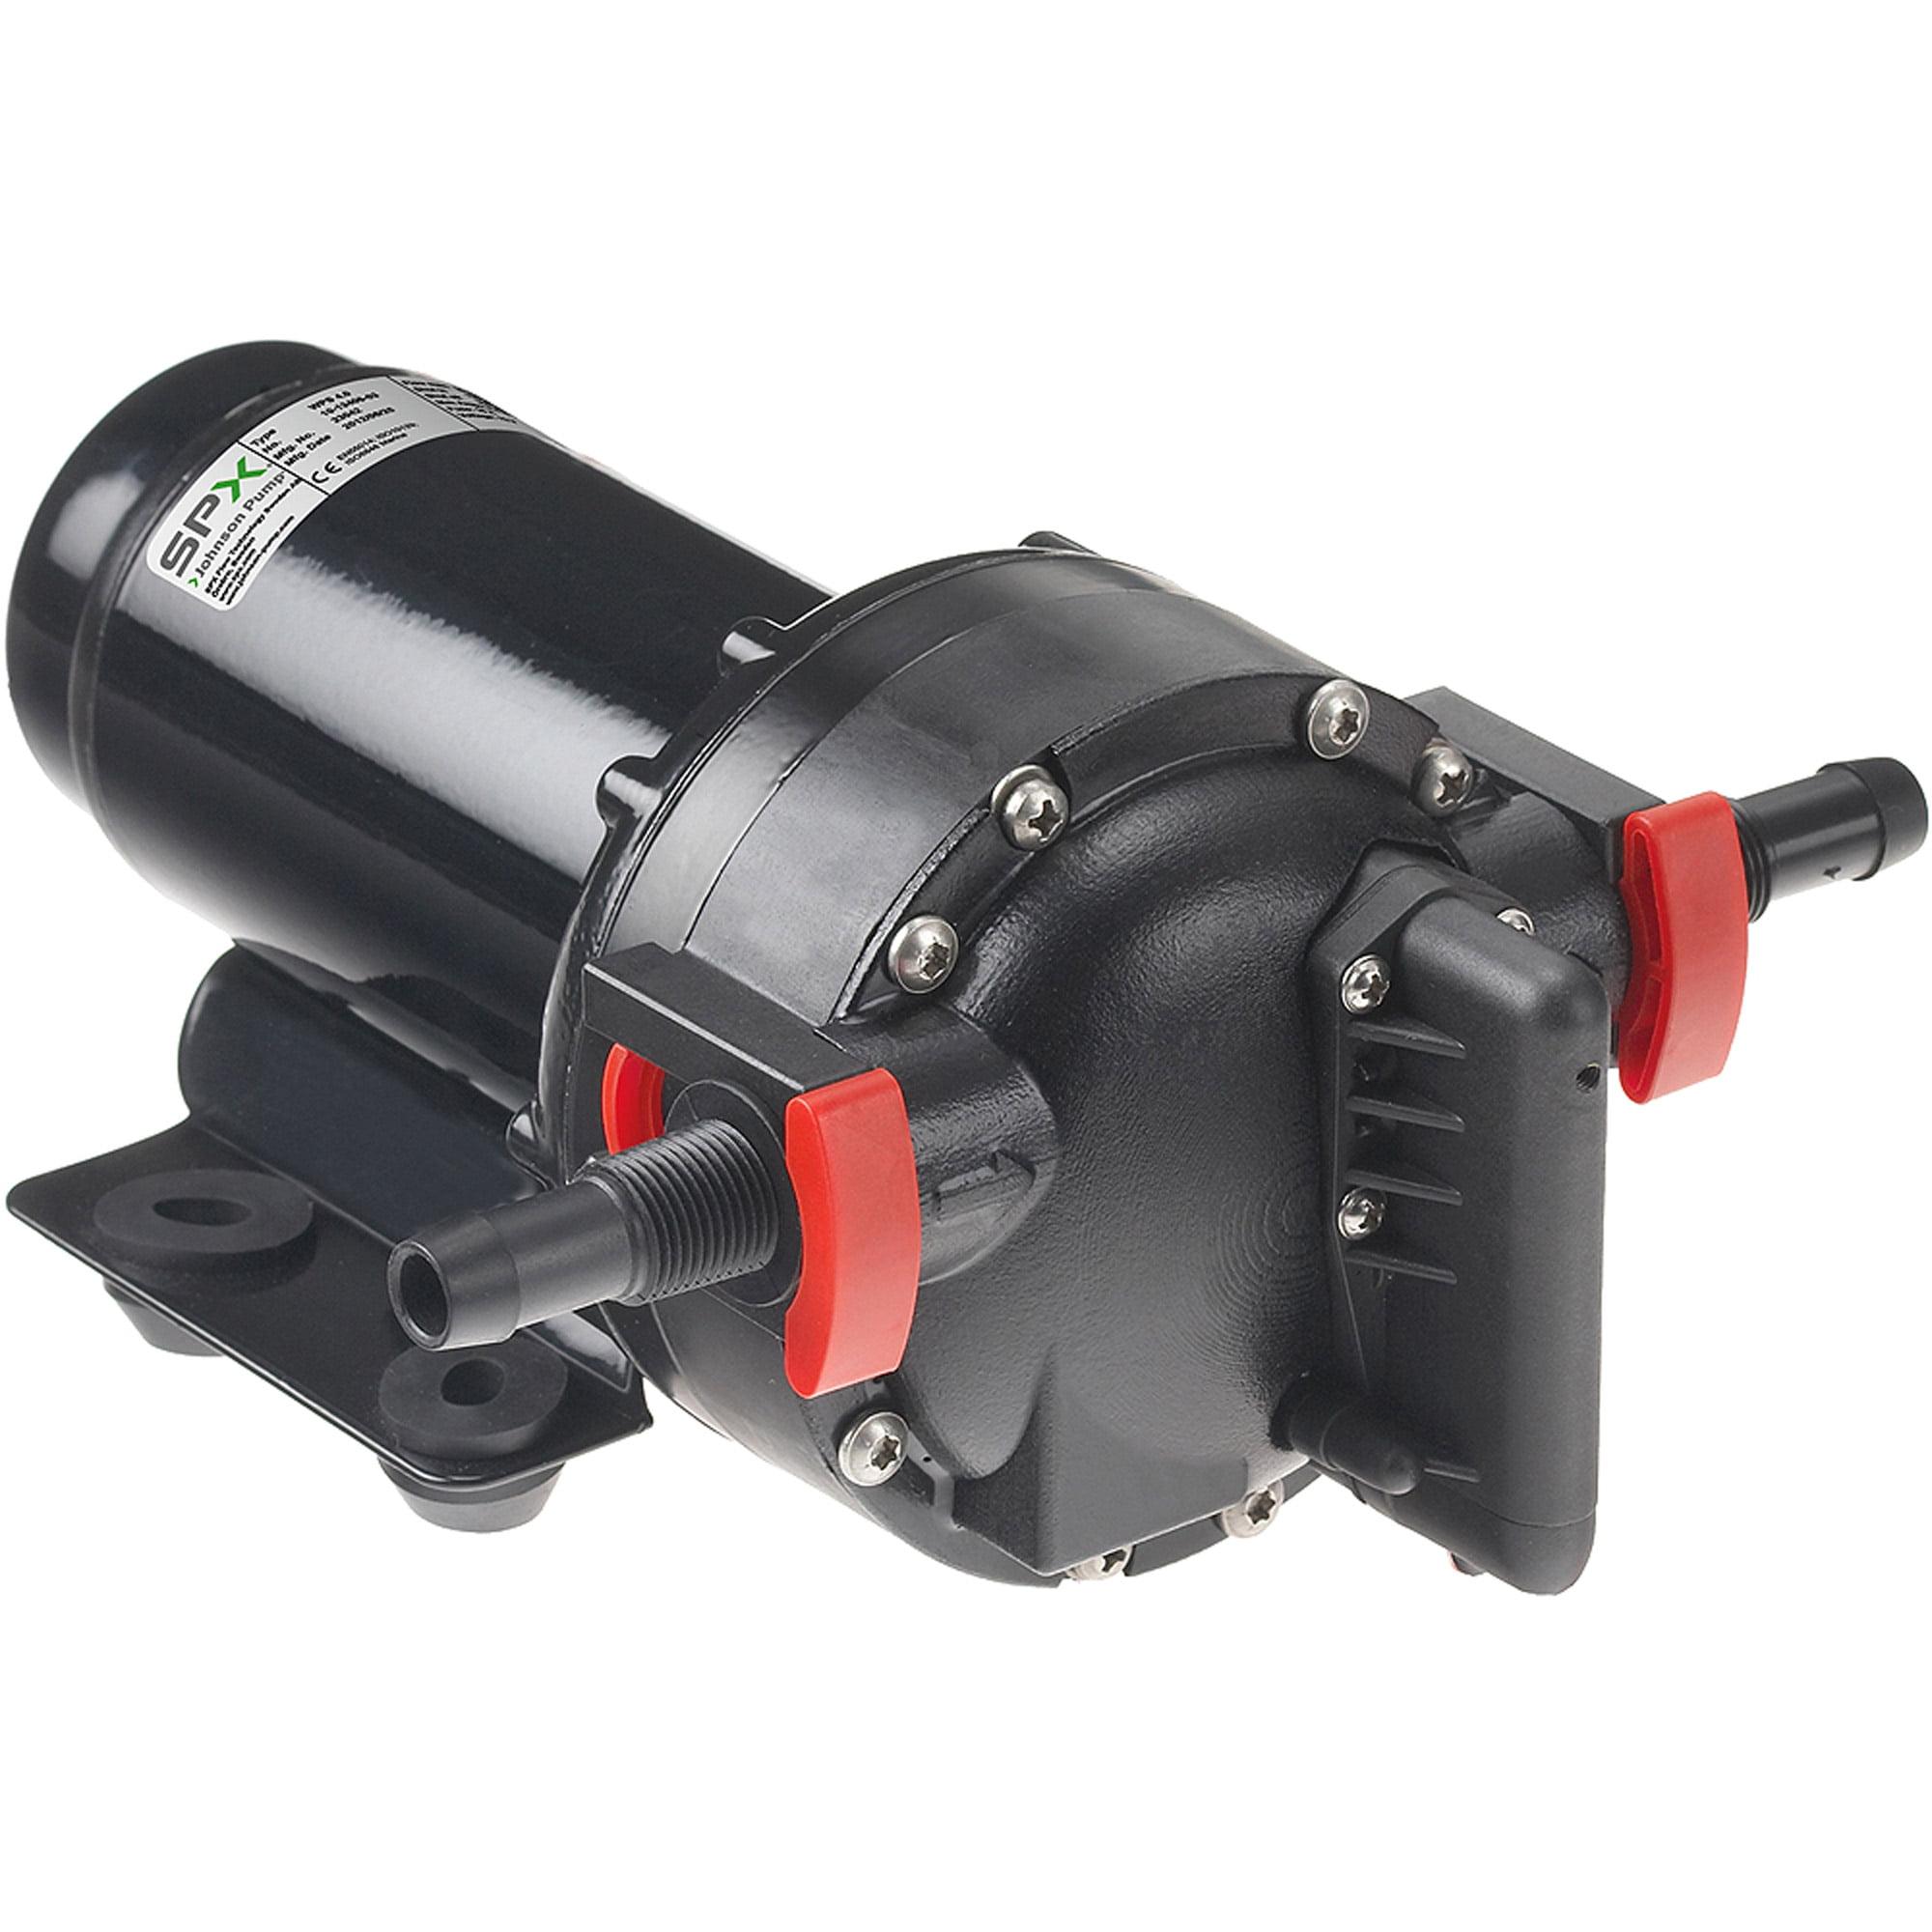 Sahara S500 Bilge Pump Wiring